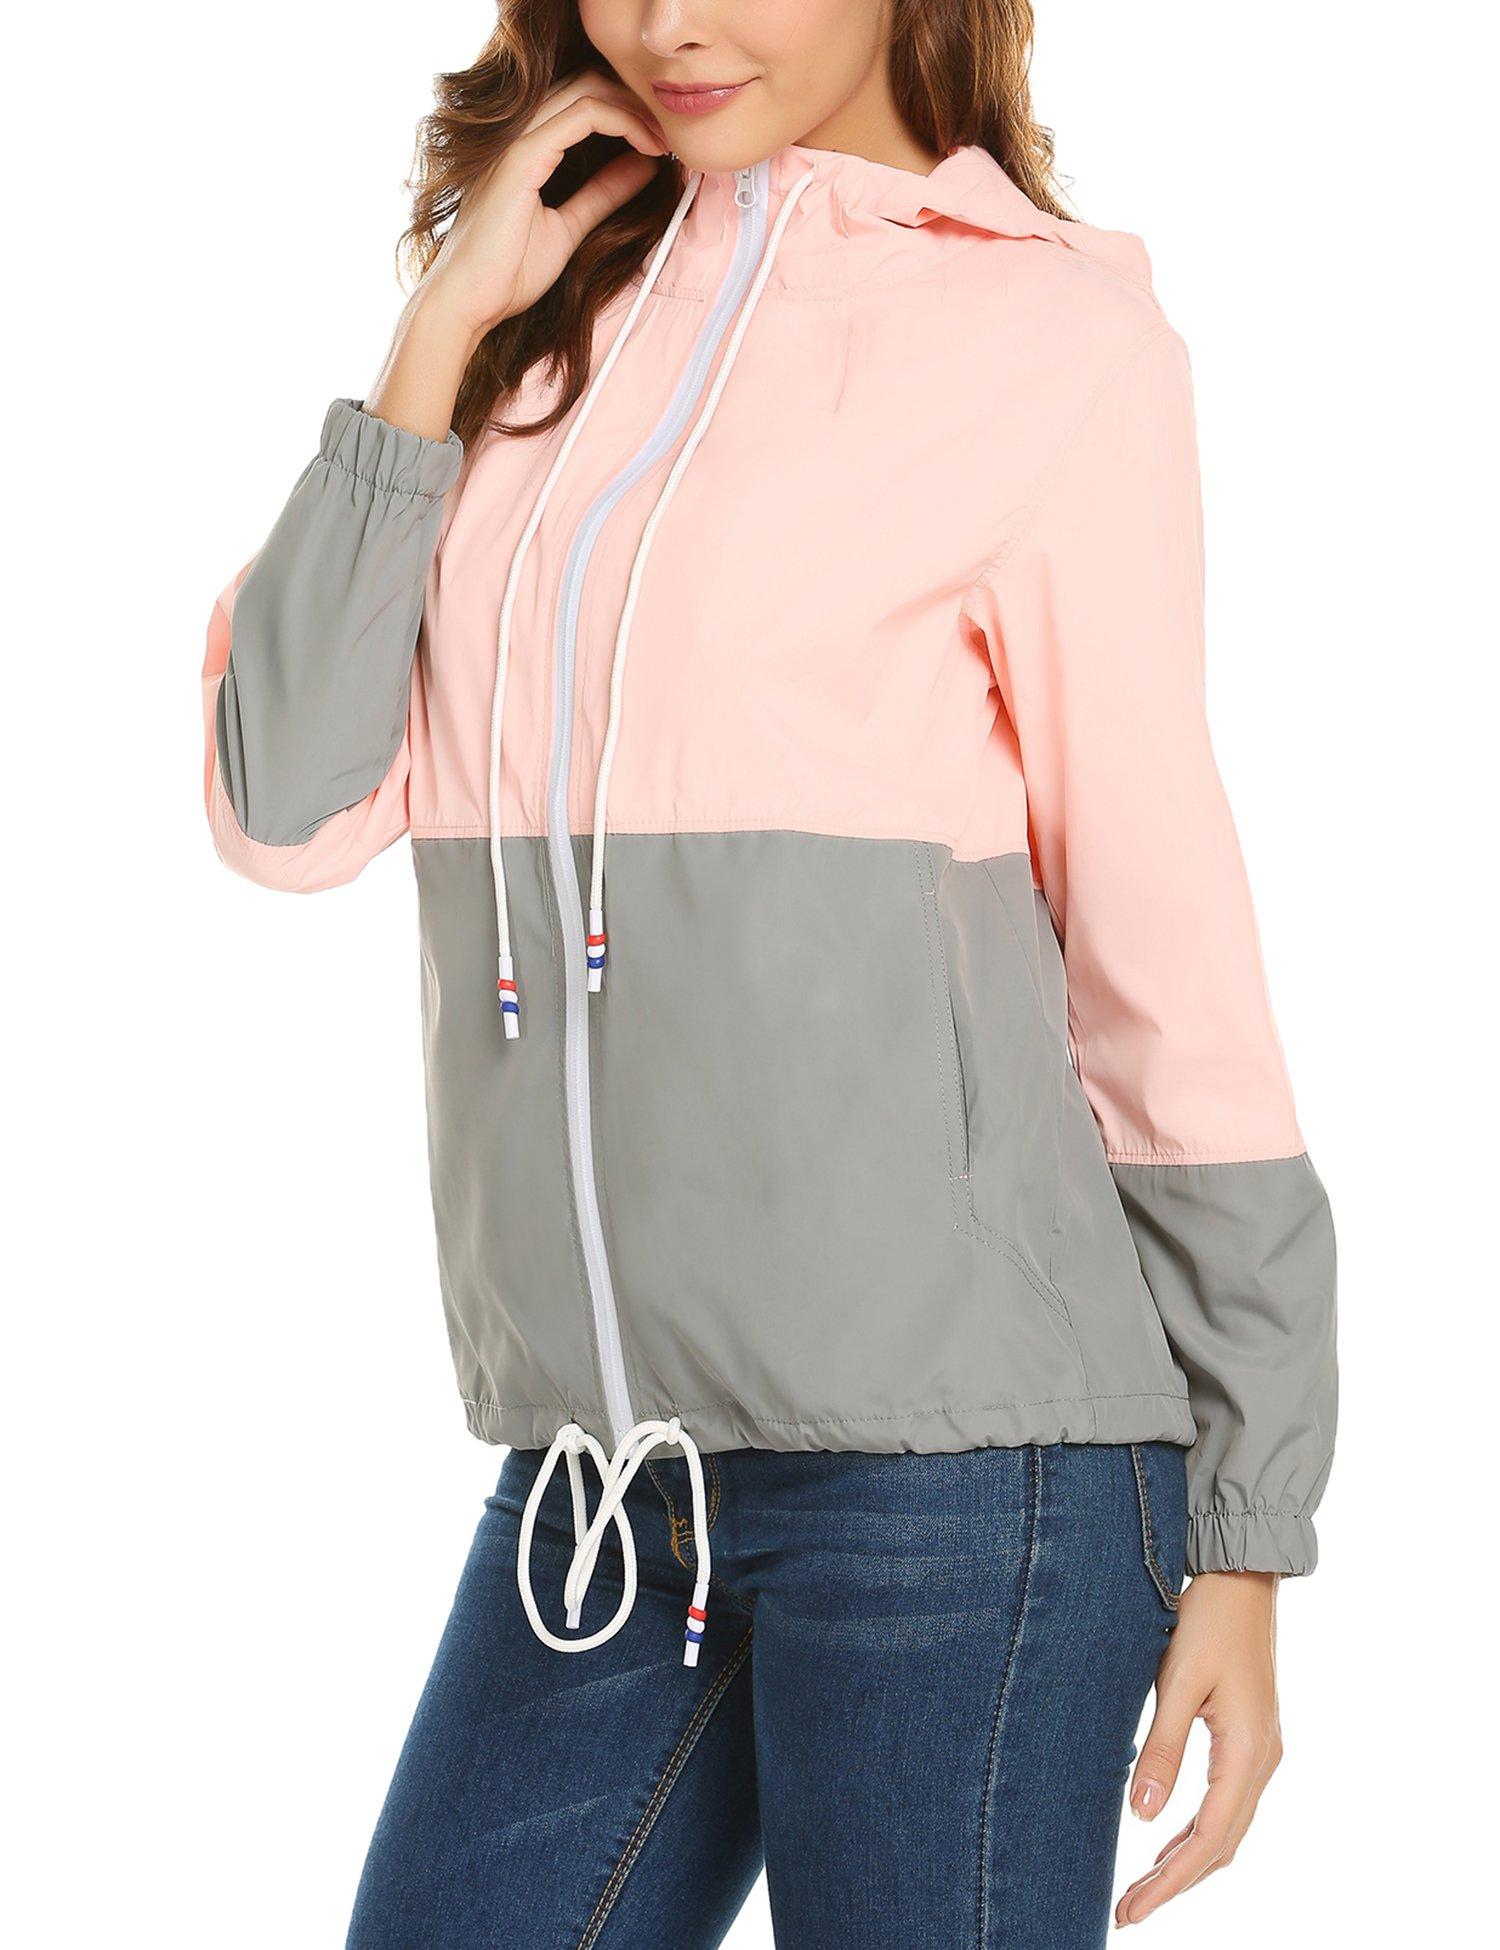 ZHENWEI Women's Lightweight Raincoat Zip up Casual Hoodie Rain Jacket Pink L by ZHENWEI (Image #5)